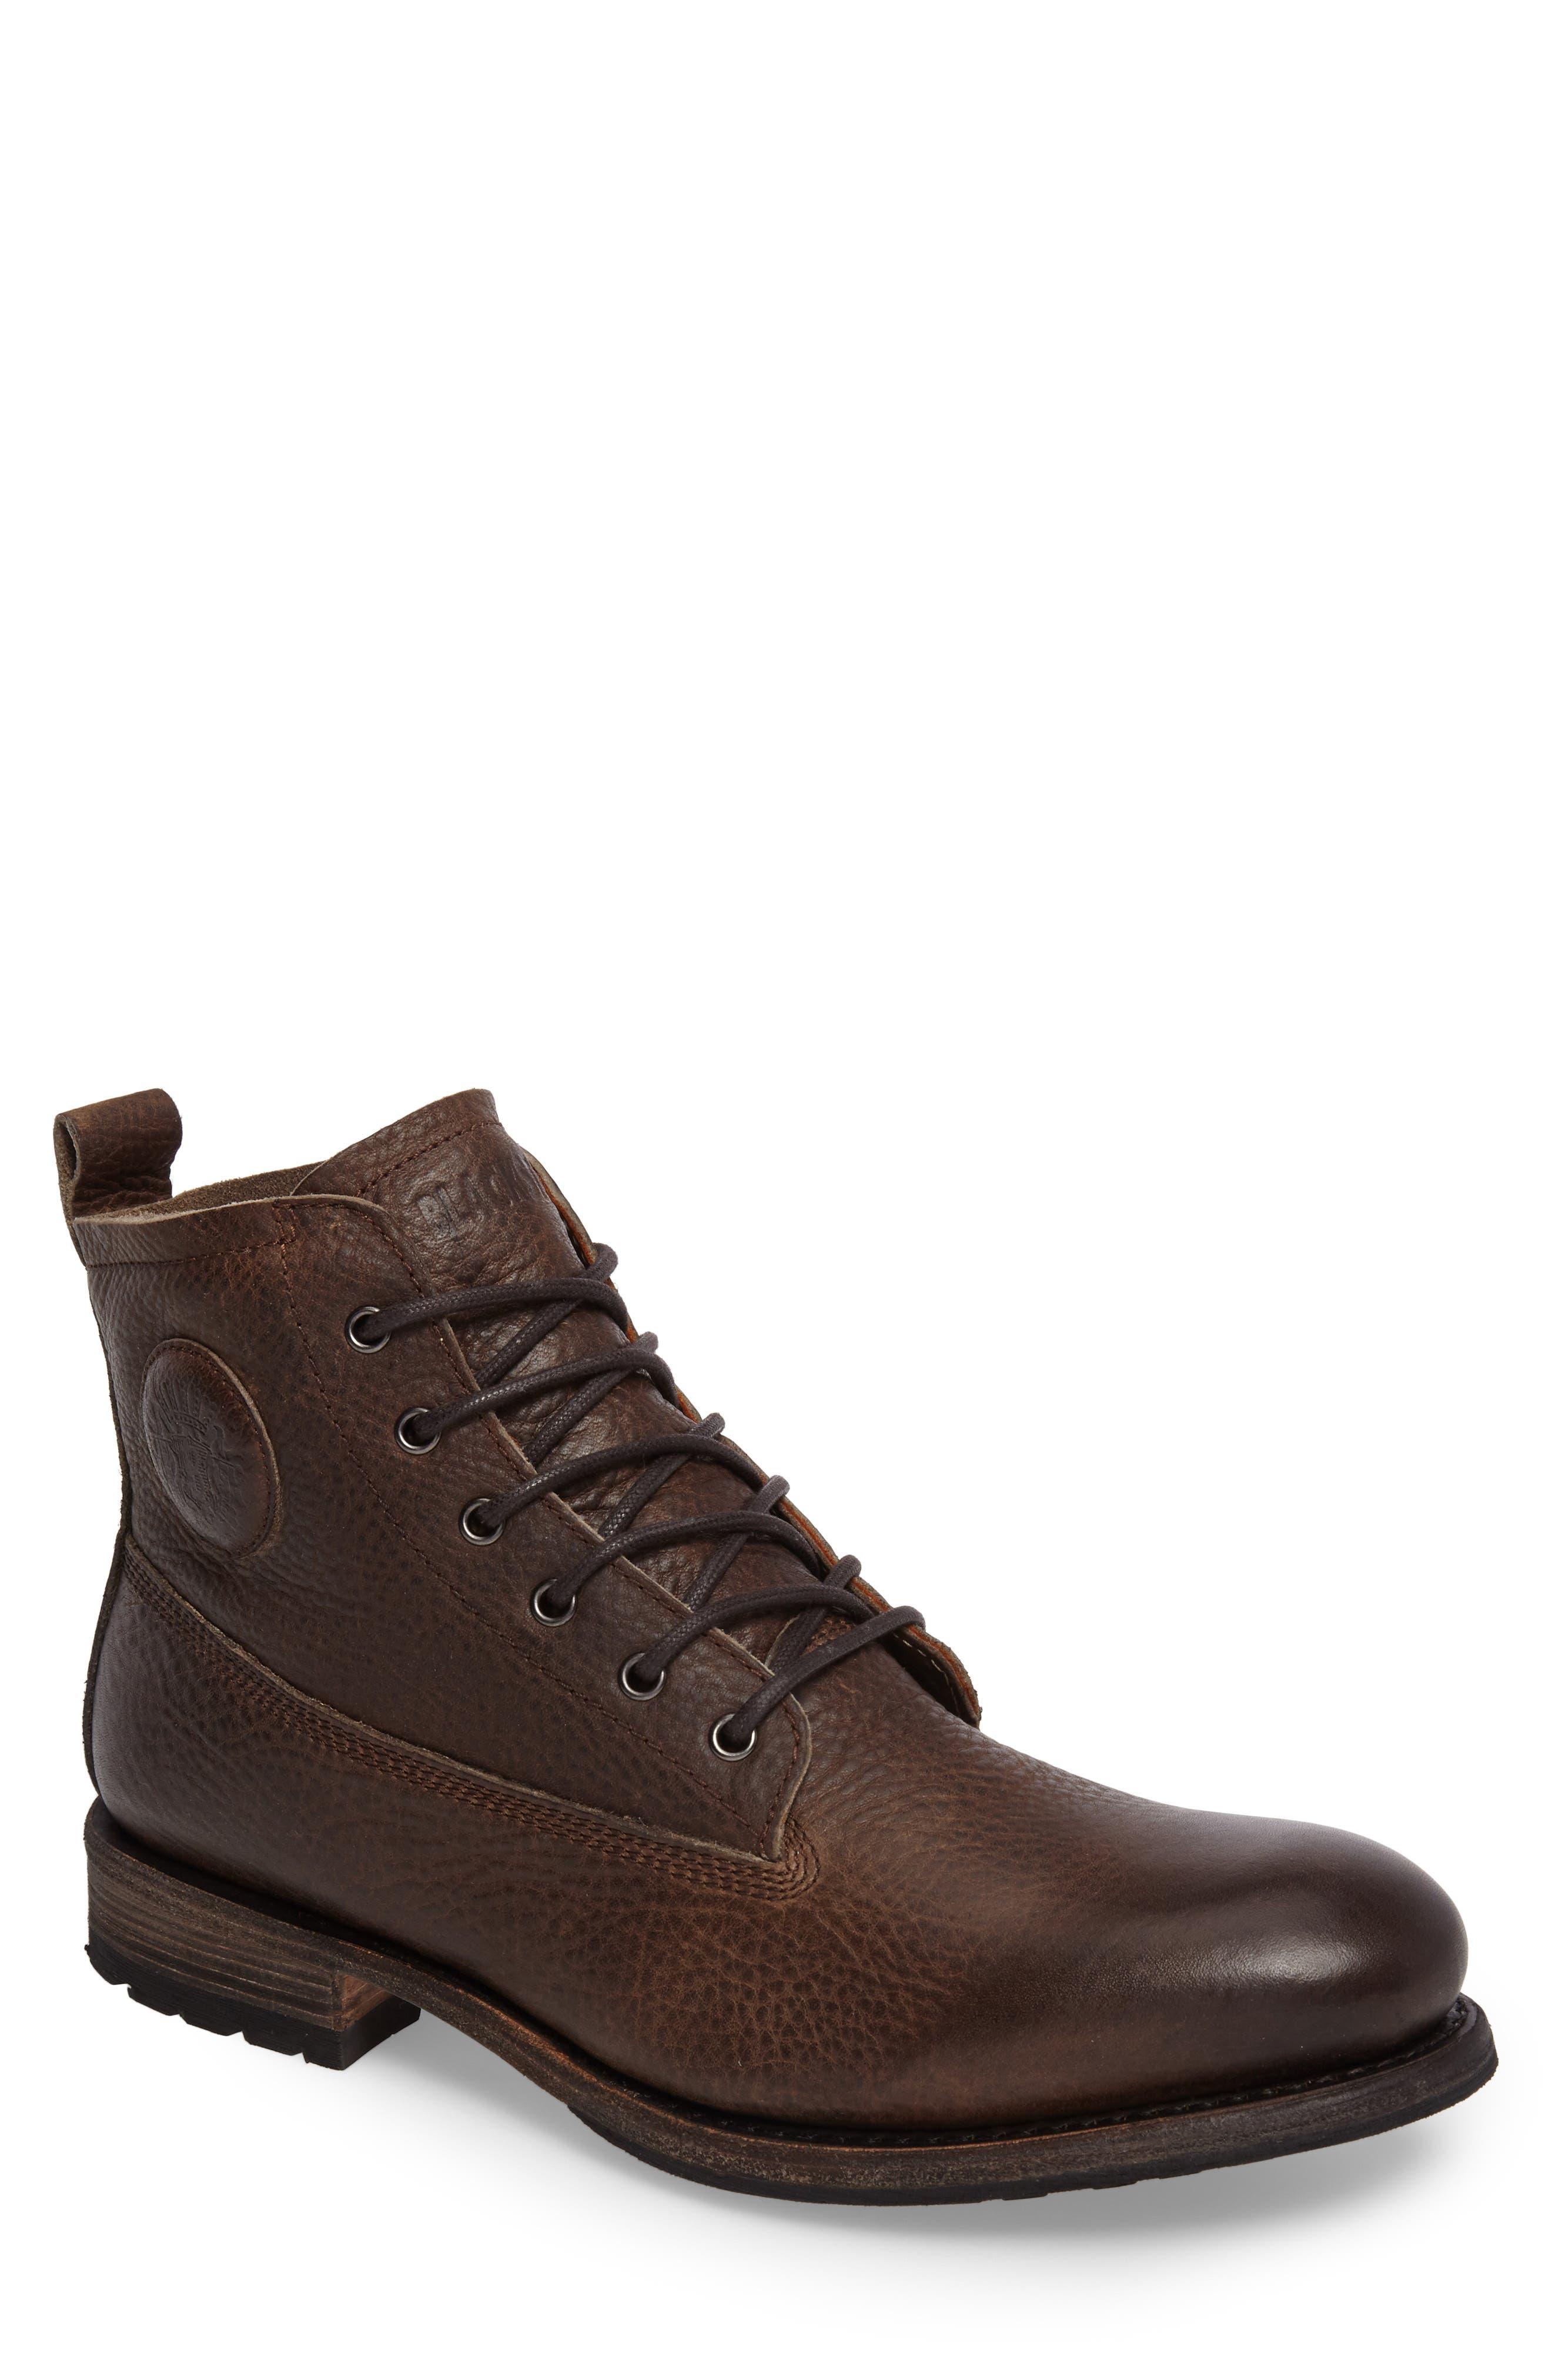 'GM 09' Plain Toe Boot,                             Main thumbnail 1, color,                             Gull Leather